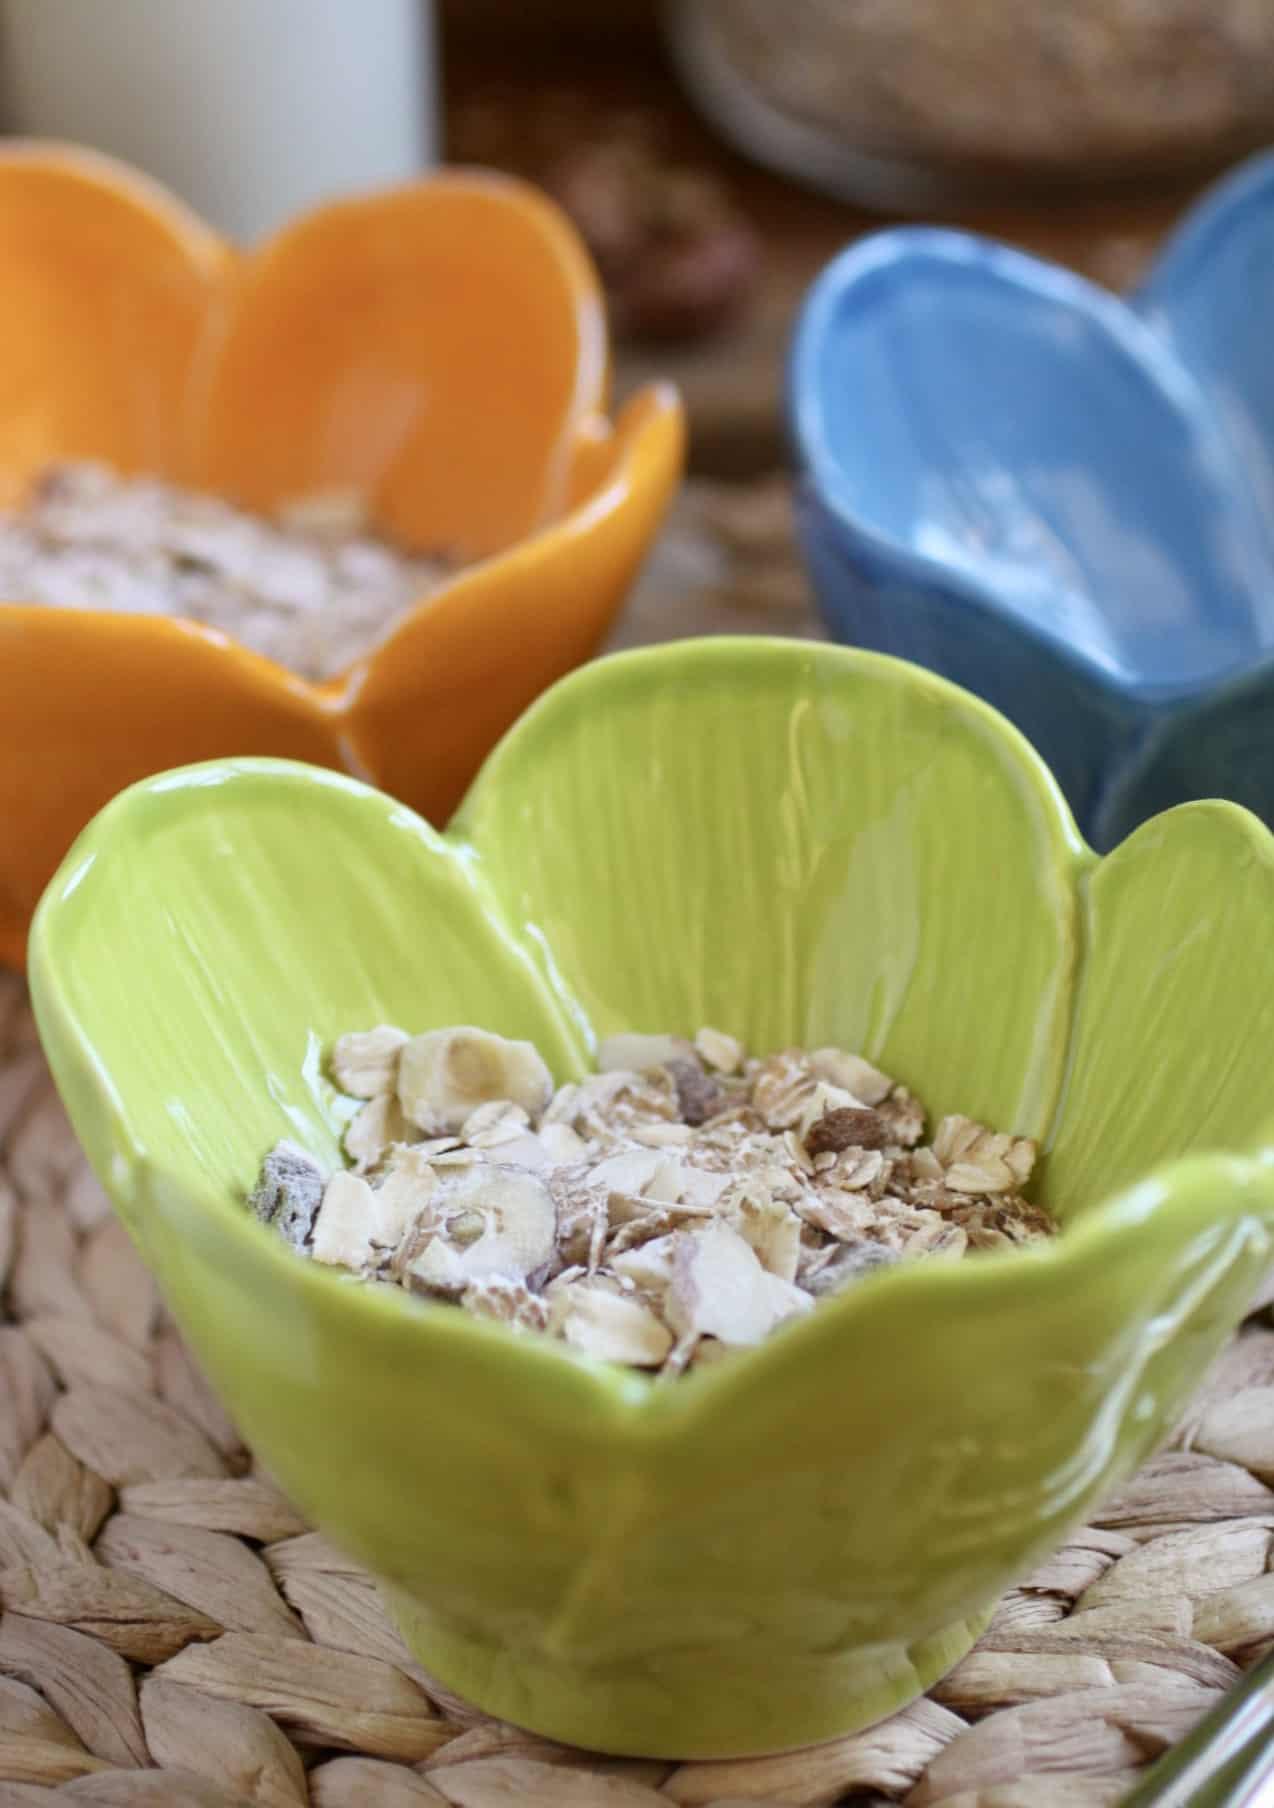 muesli in flower bowls